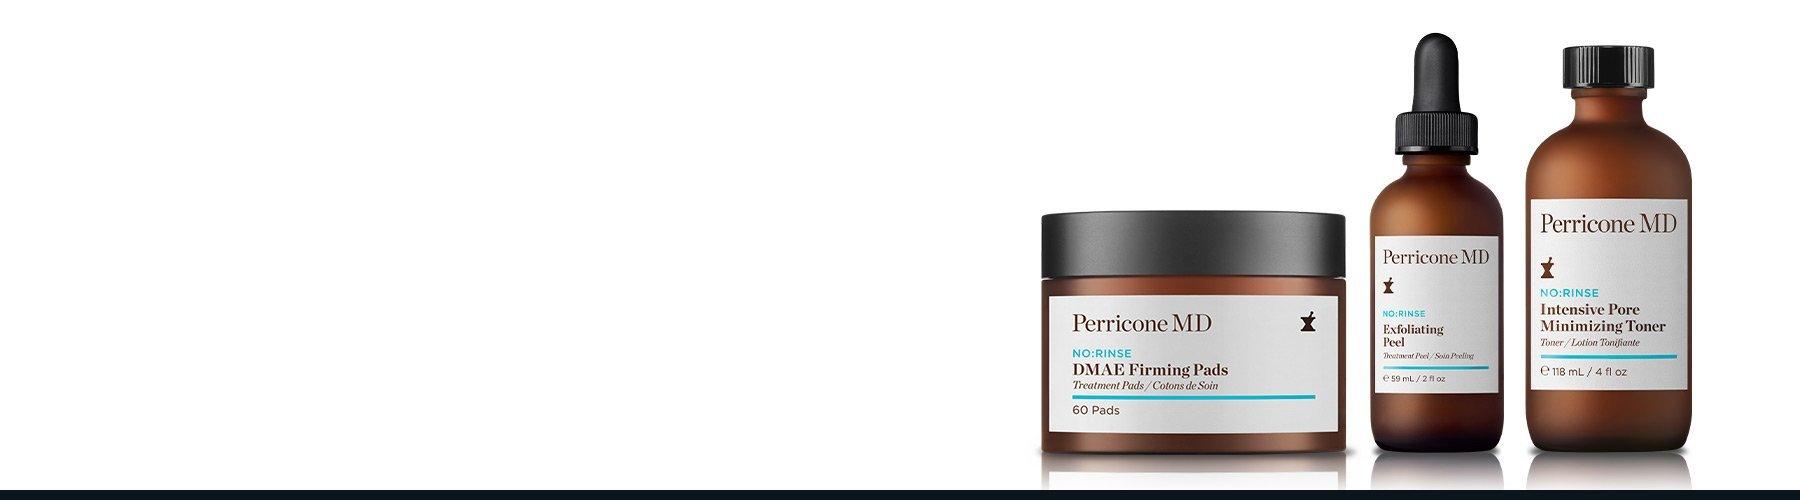 Exfoliators & toners Perricone MD